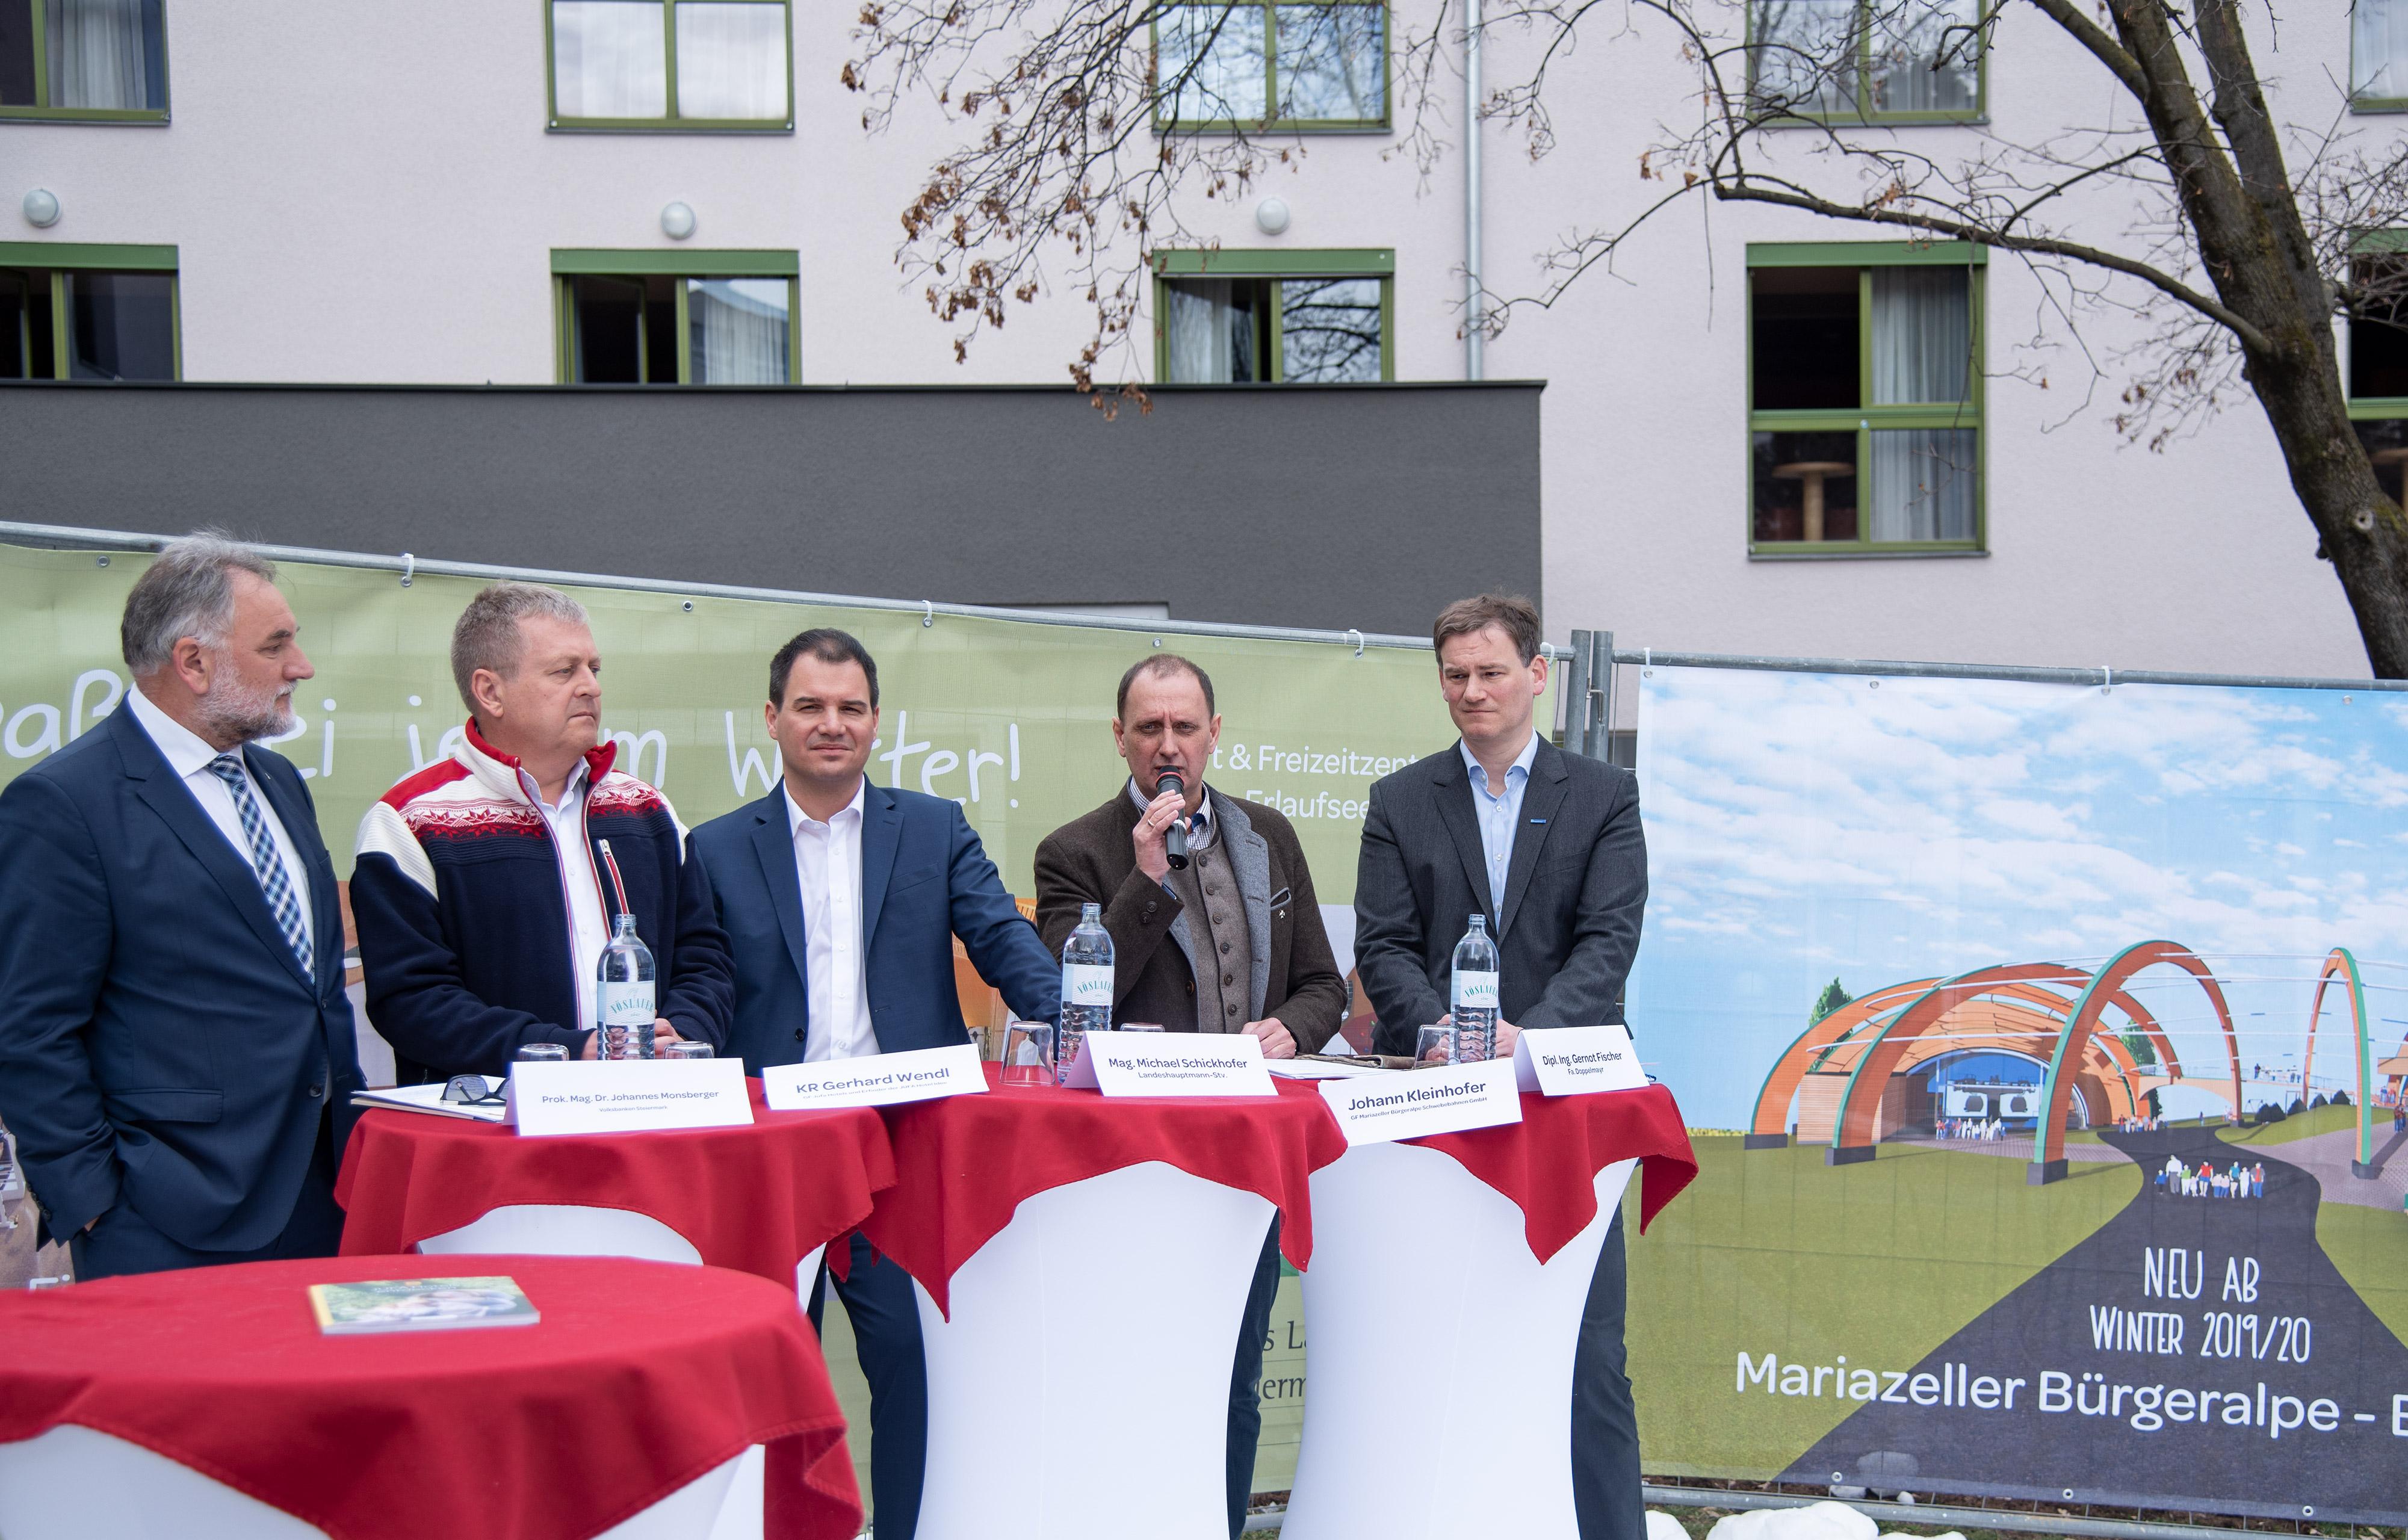 Pressekonferenz Bürgeralpe v.l.n.r.: Johannes Monsberger, Gerhard Wendl, Michael Schickhofer, Johann Kleinhofer, Gernot Fischer © Aldin Bektaš, Land Steiermark